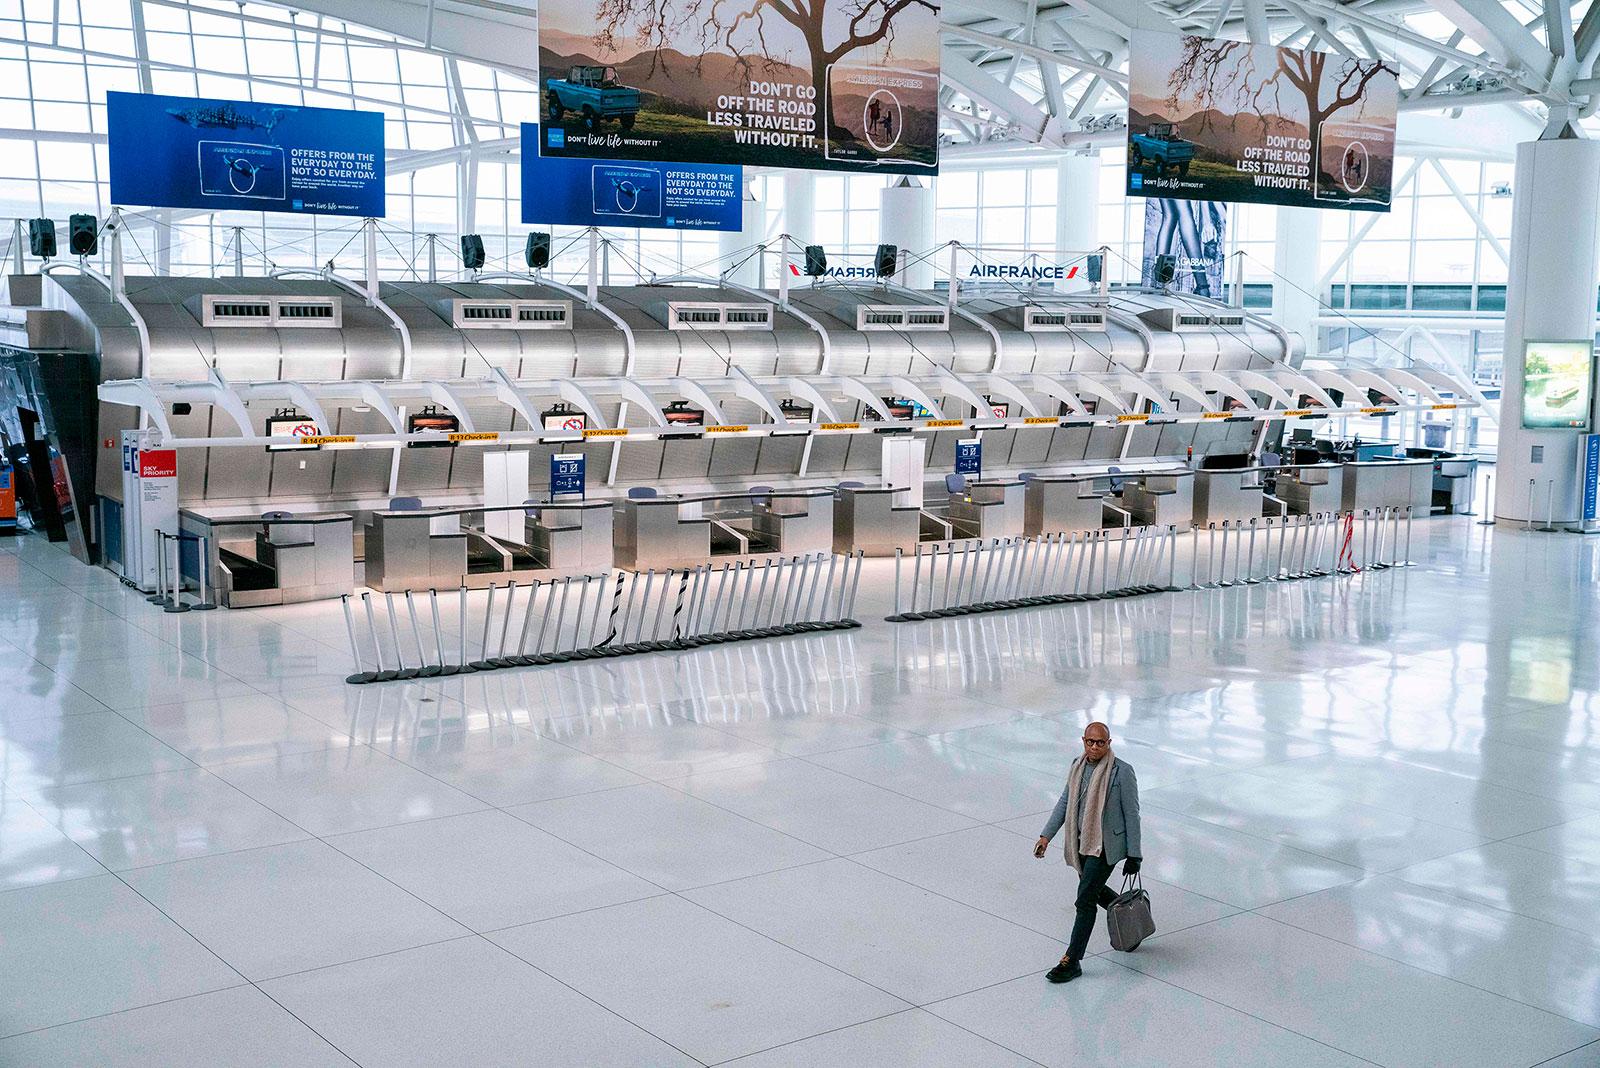 A man walks through Terminal 1 at John F. Kennedy International Airport on March 12.